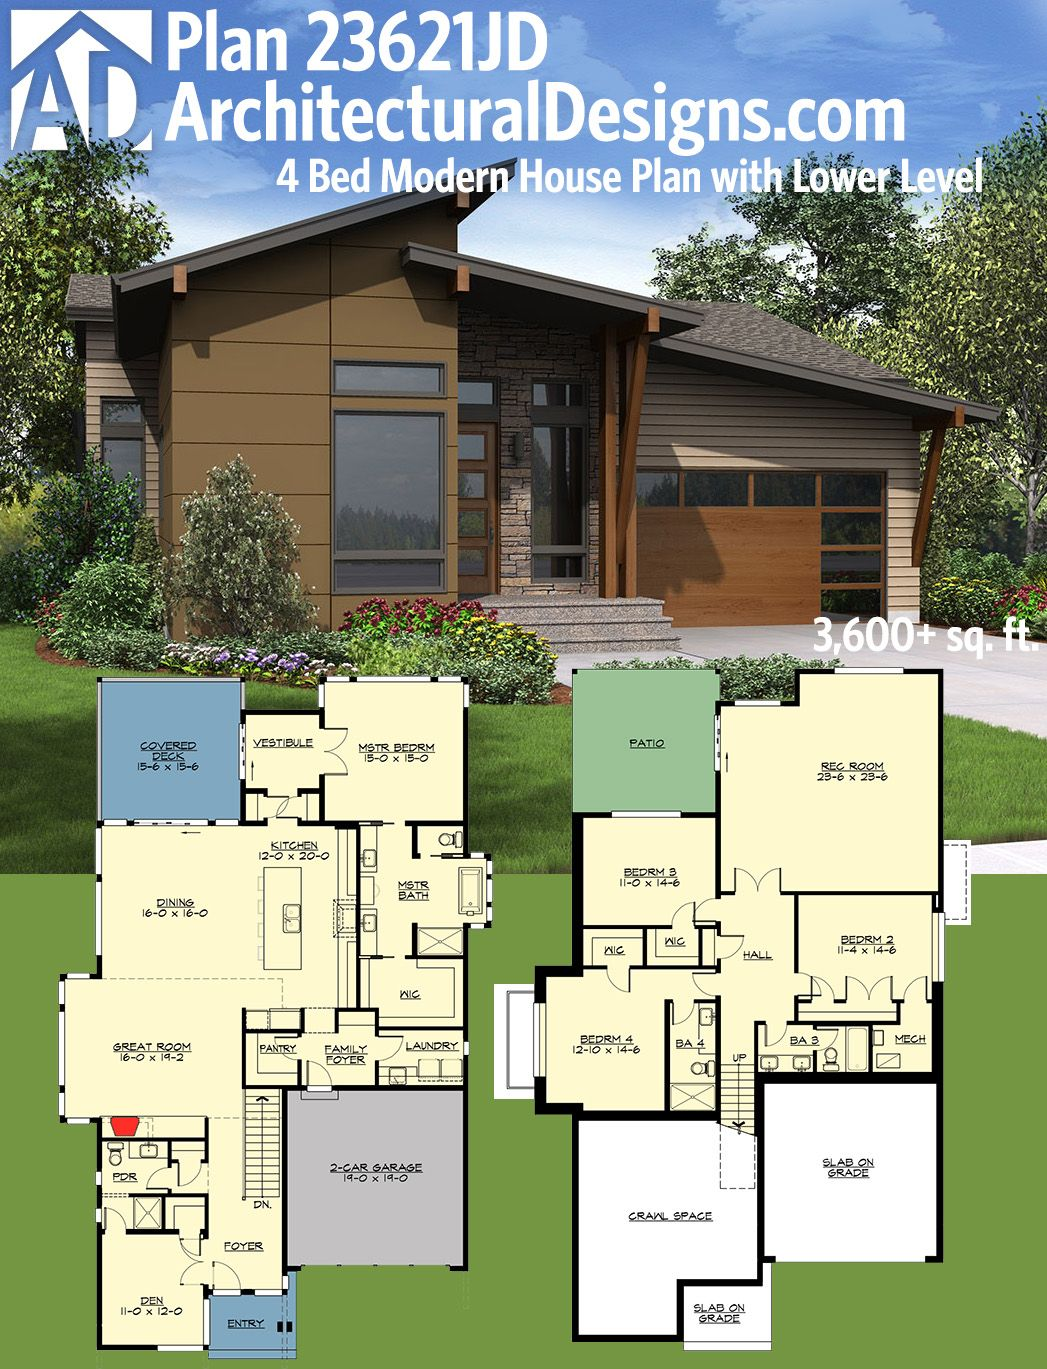 Architectural Designs Modern House Plan 23621JD 4